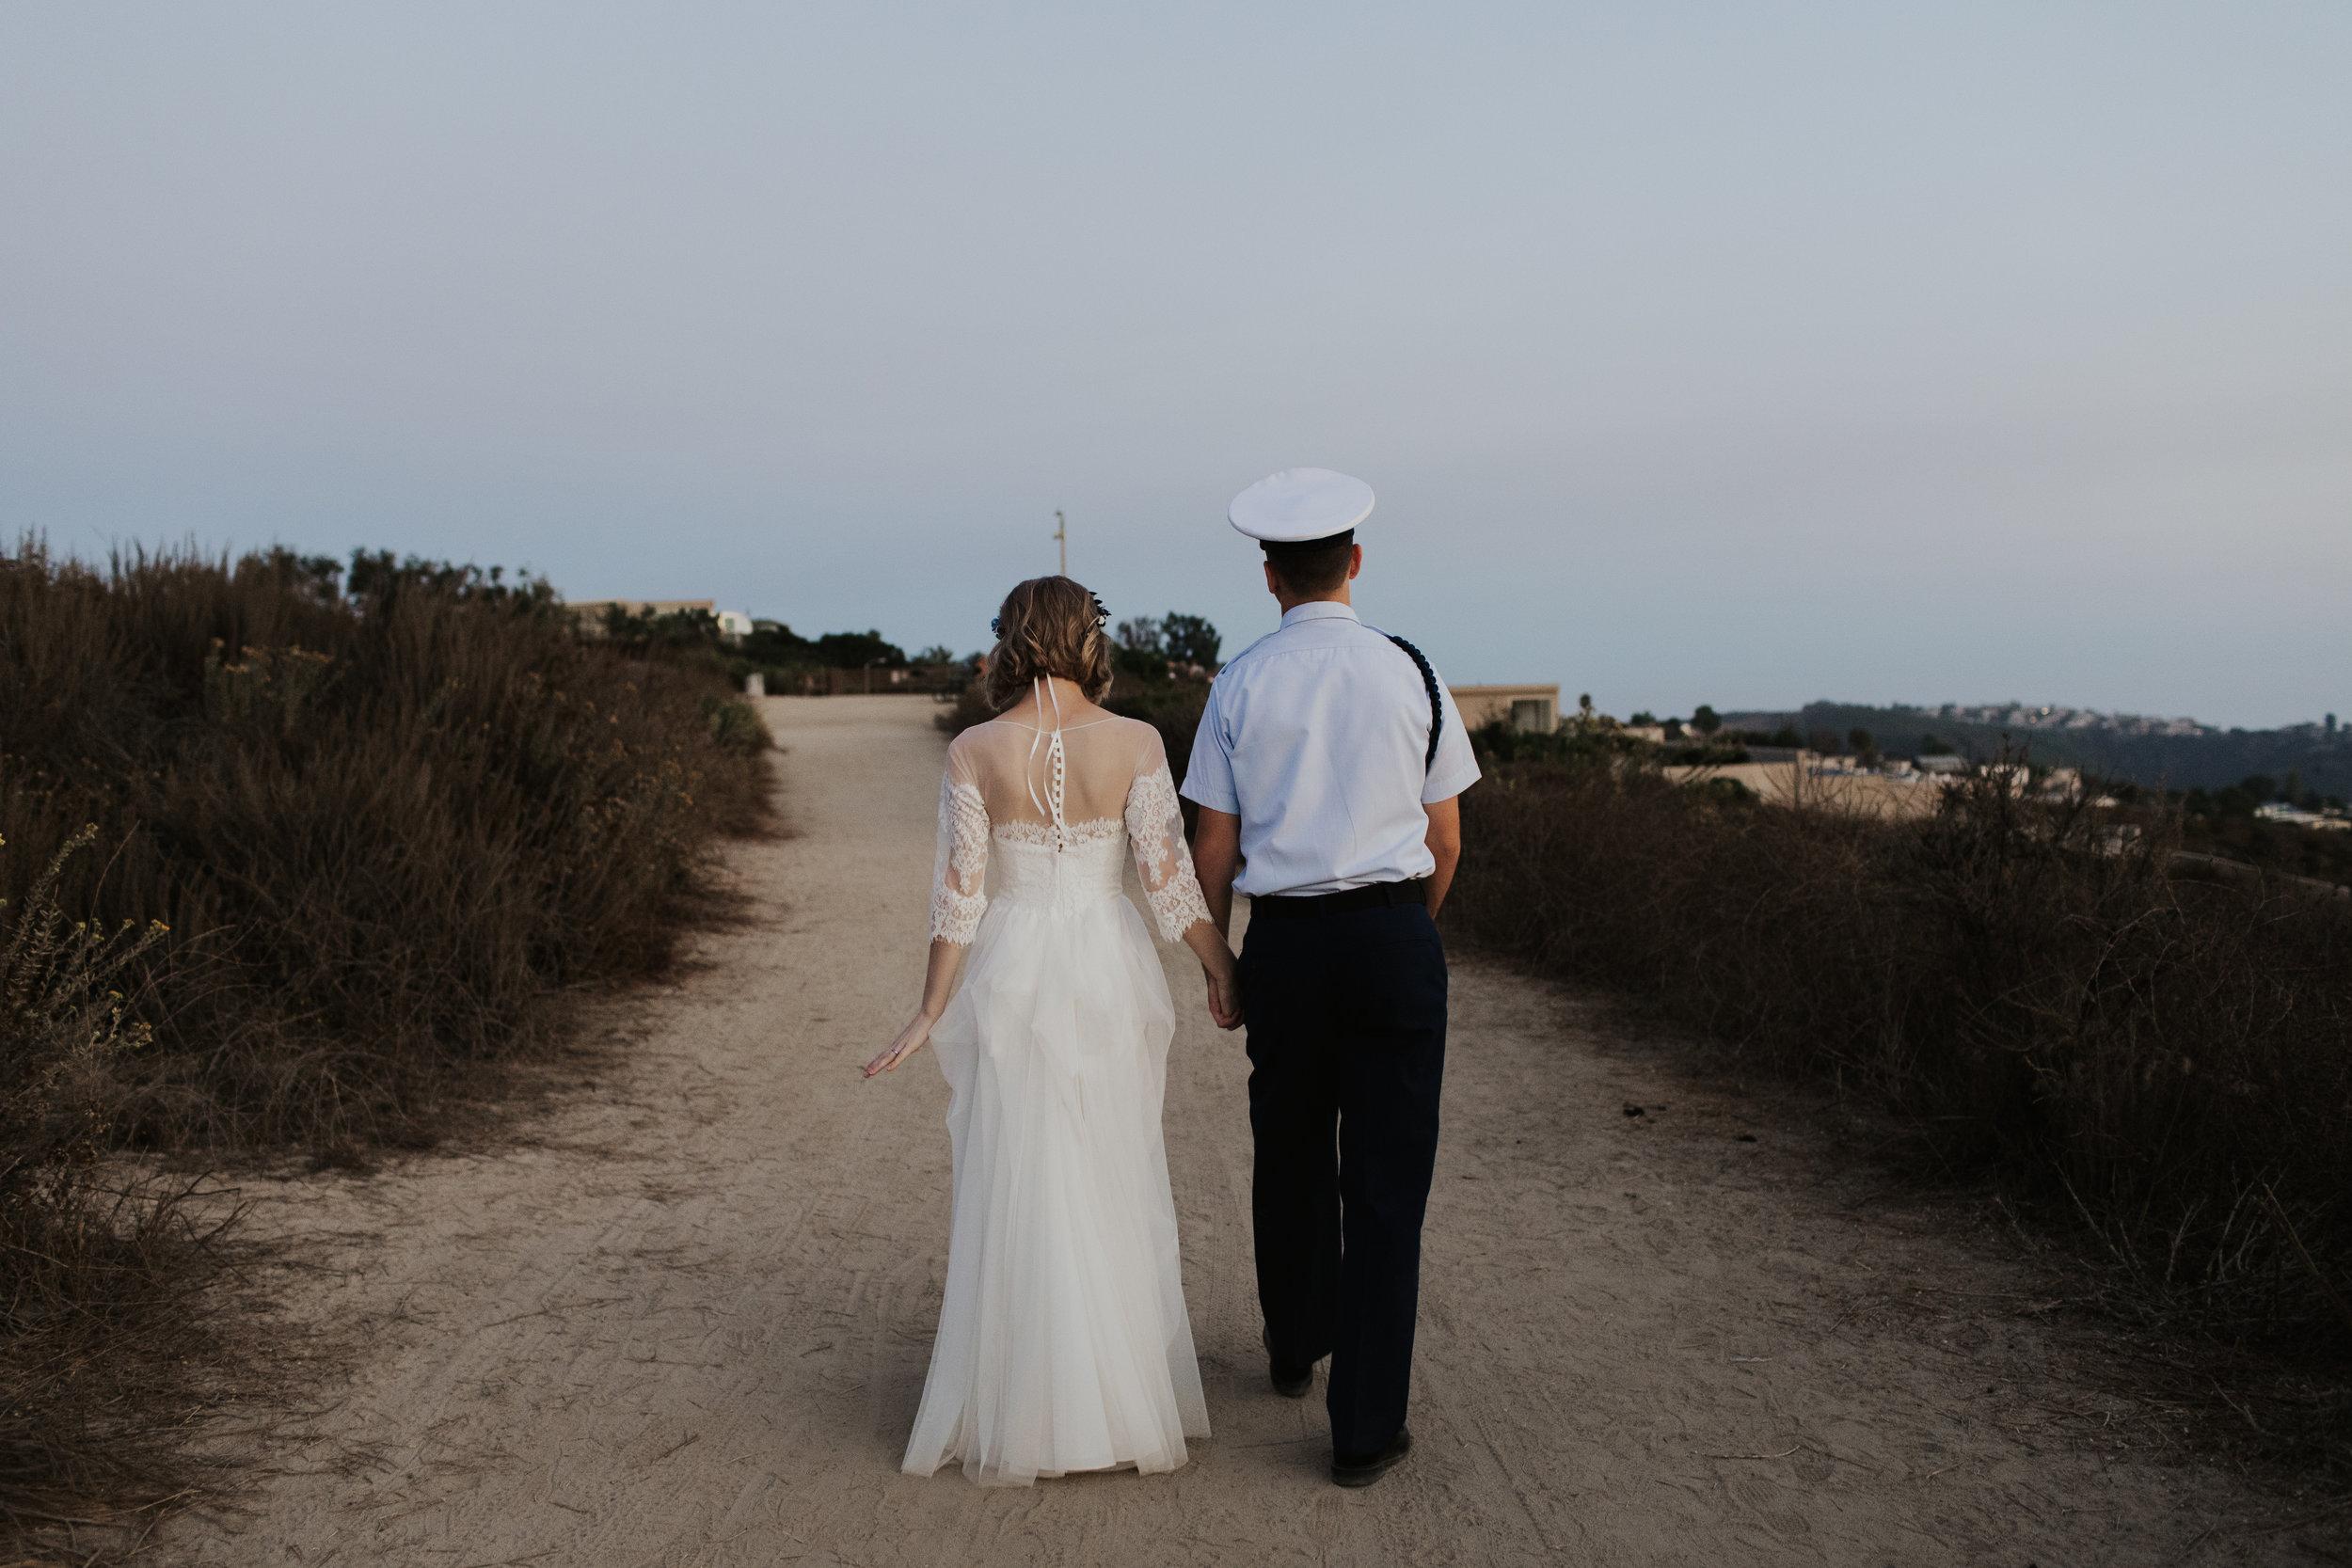 Jessie-Noah-Top-of-the-World-Laguna-Beach-Elopement-Bridal-Wedding-Session-FINISHED-76.jpg